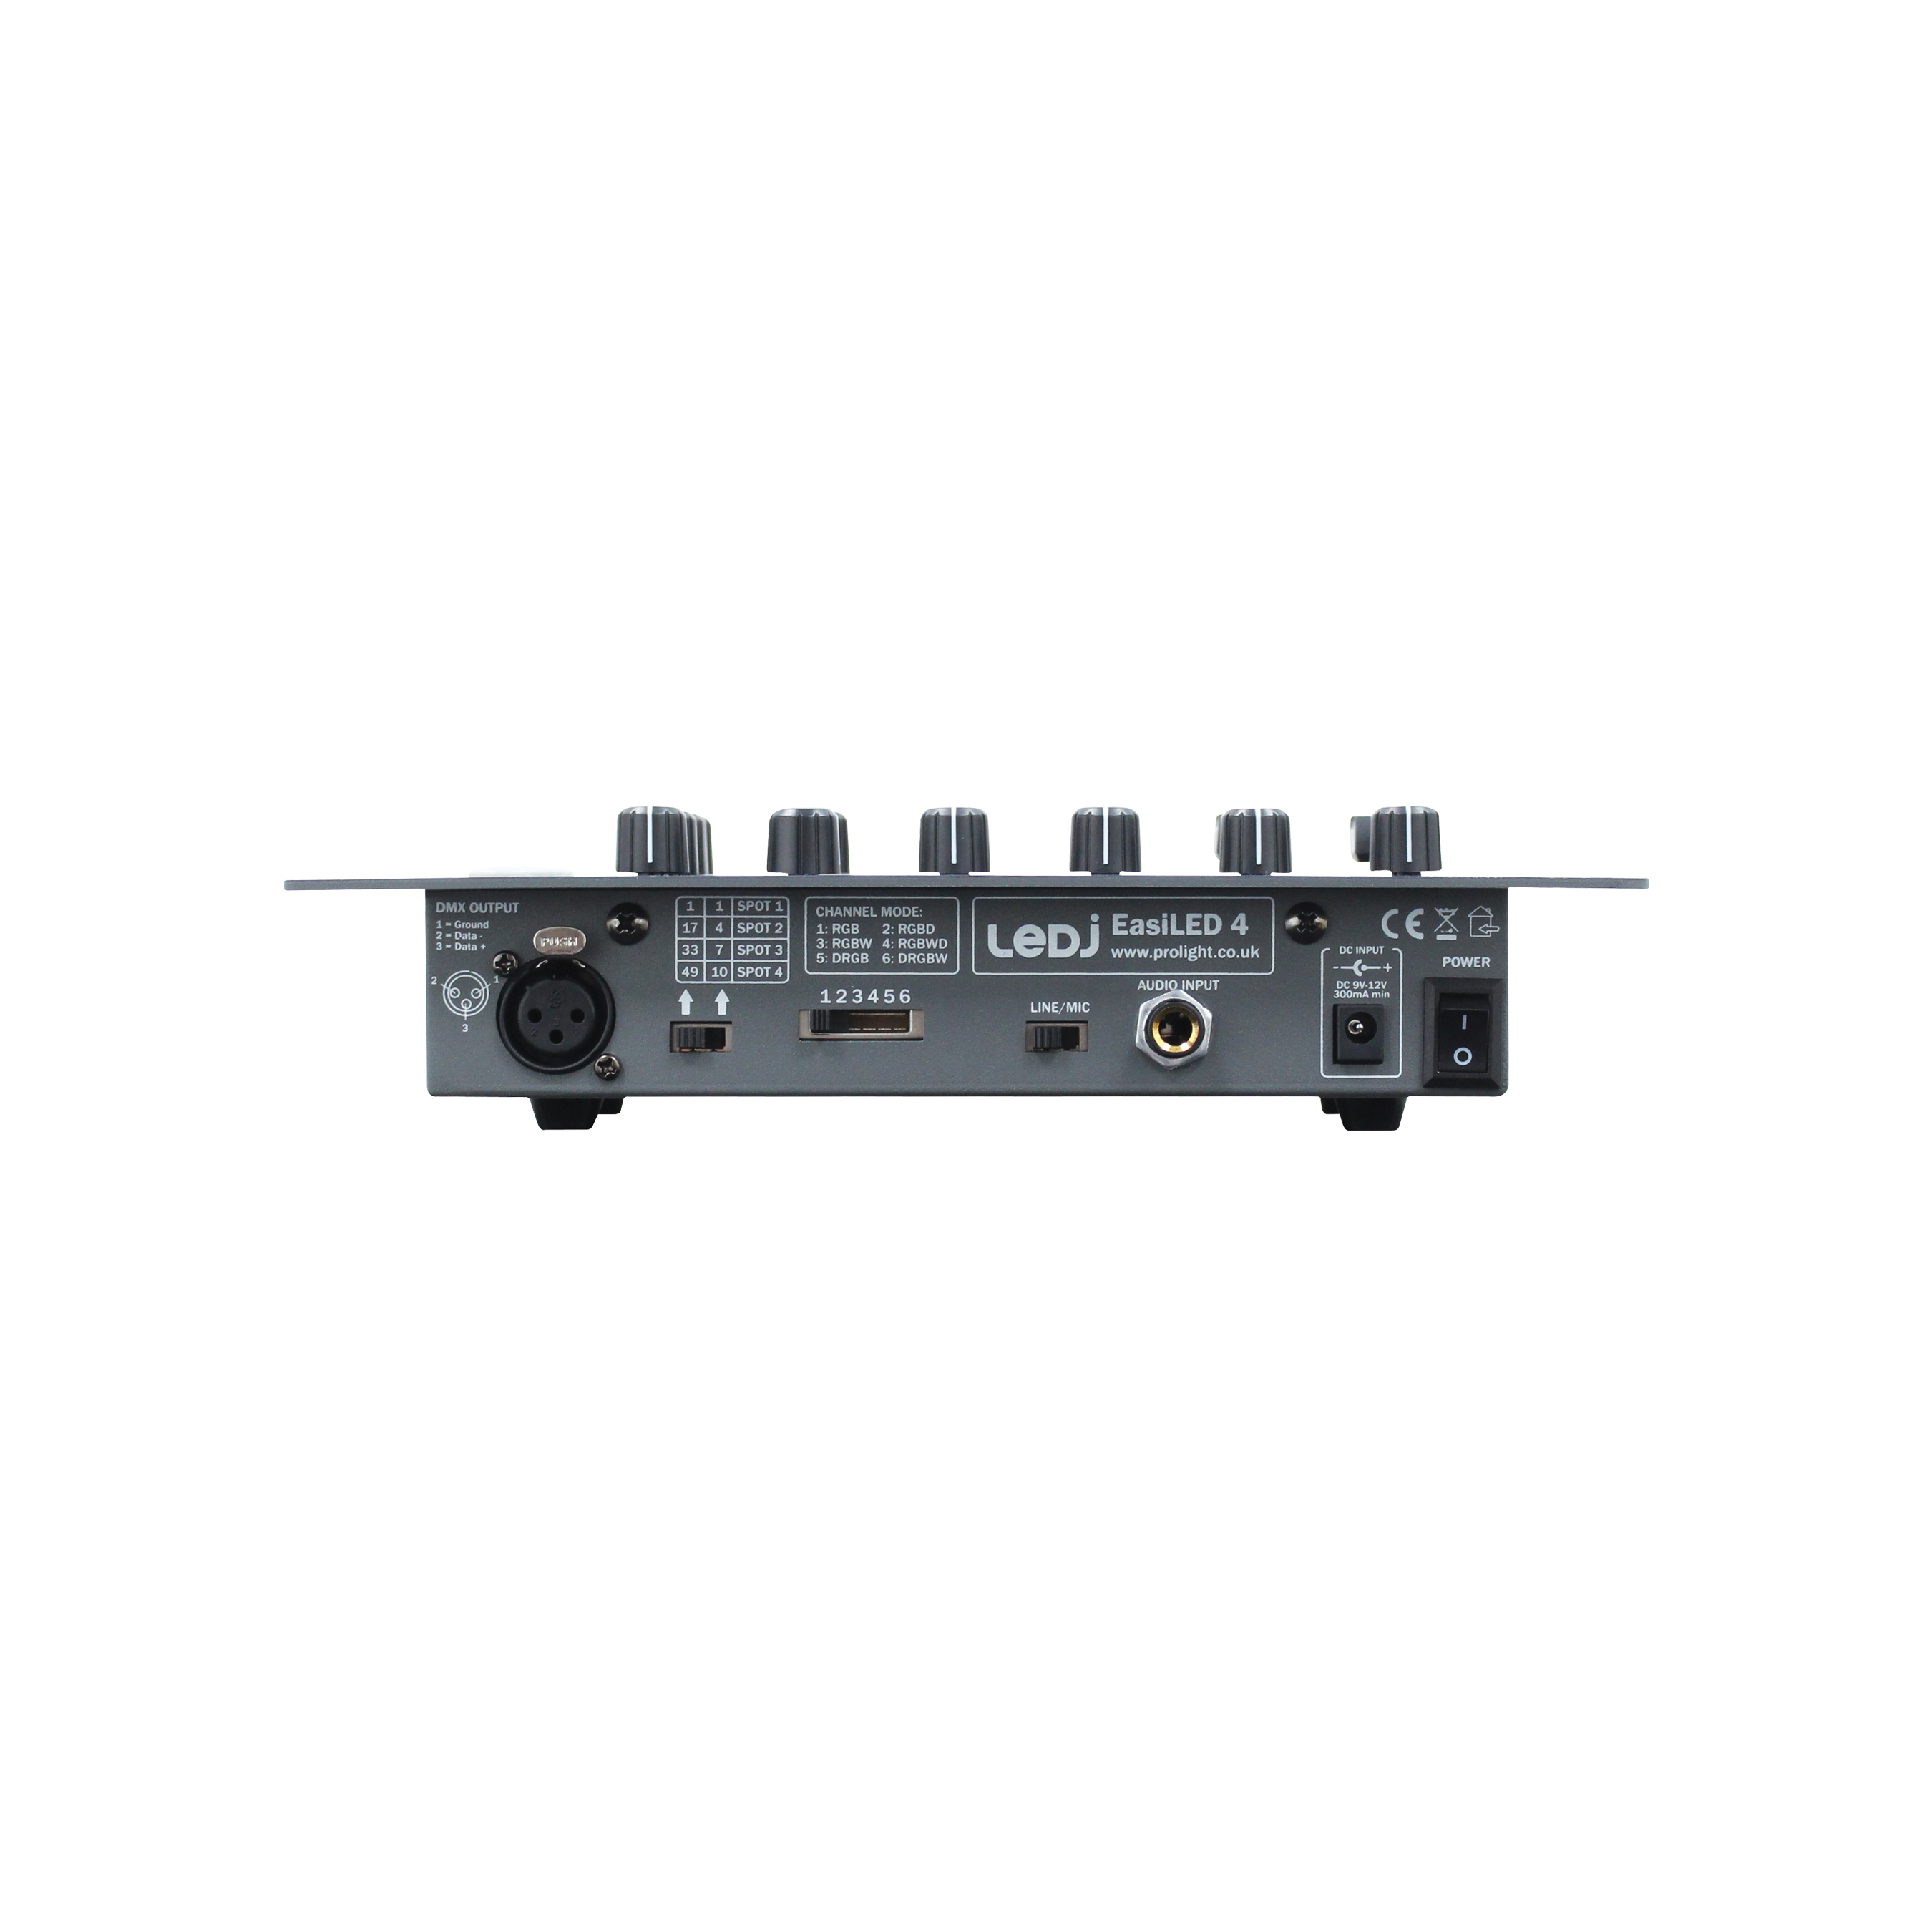 LEDJ EasiLED 4 DMX Controller